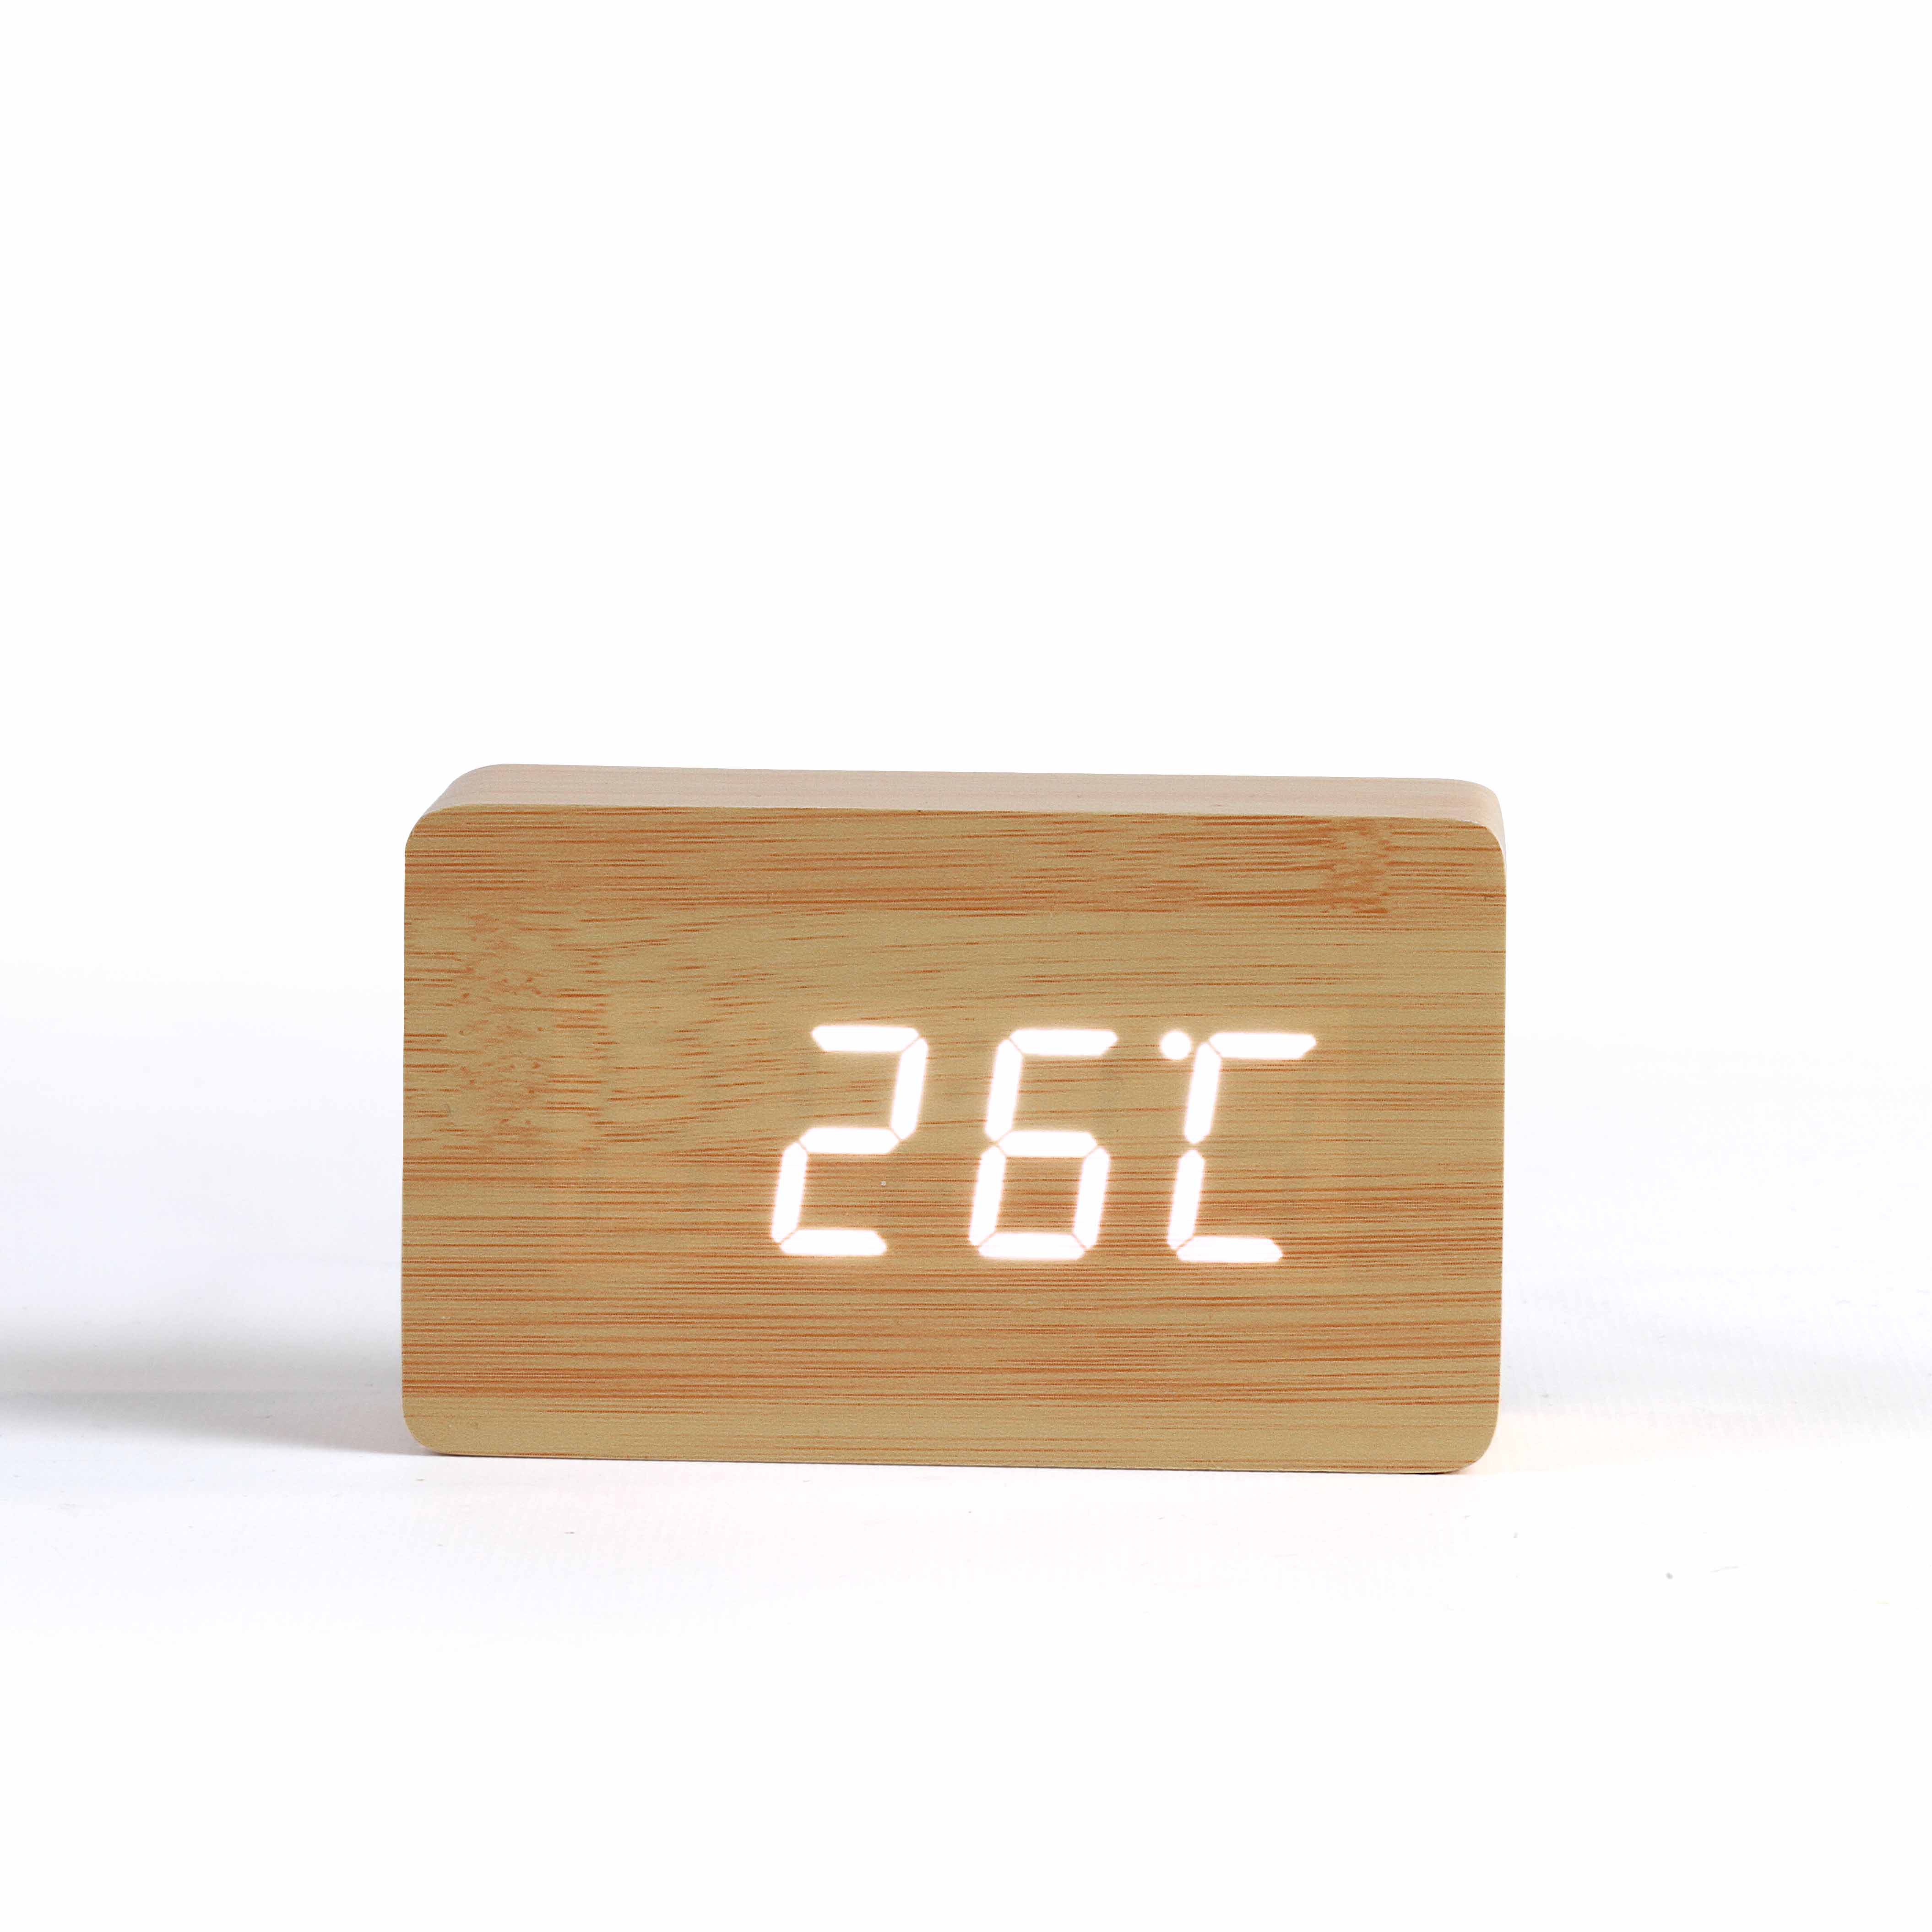 Horloge digitale aspect bois - 30-1229-2